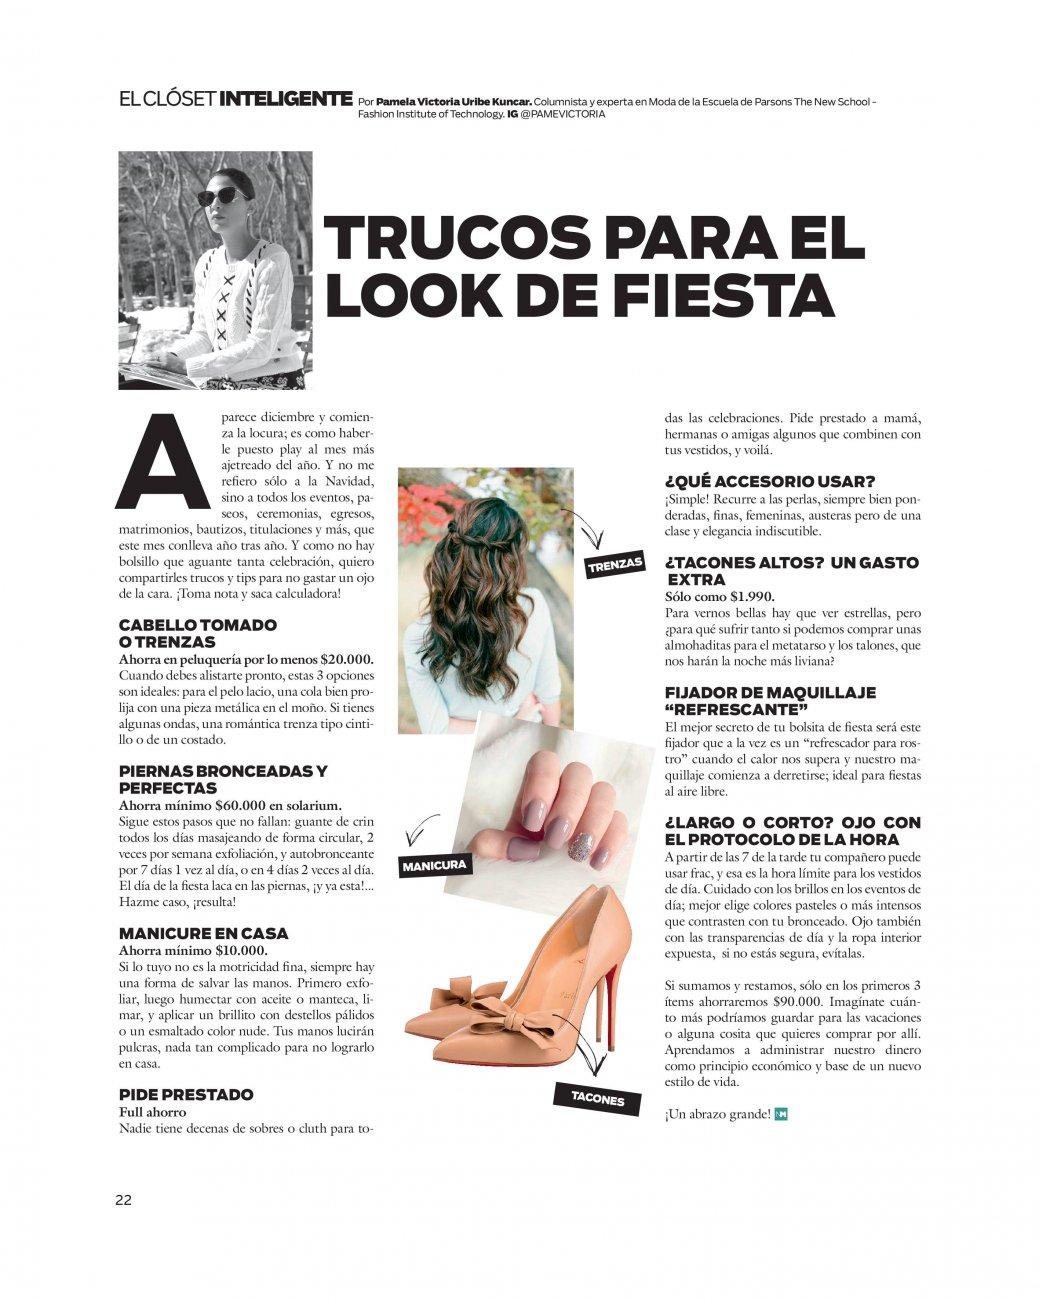 Pamela Victoria - columnista de moda en Chile - asesoria  de vestuario - tips de moda - fiestas de fin de año - ahorra en fiestas de fin de año